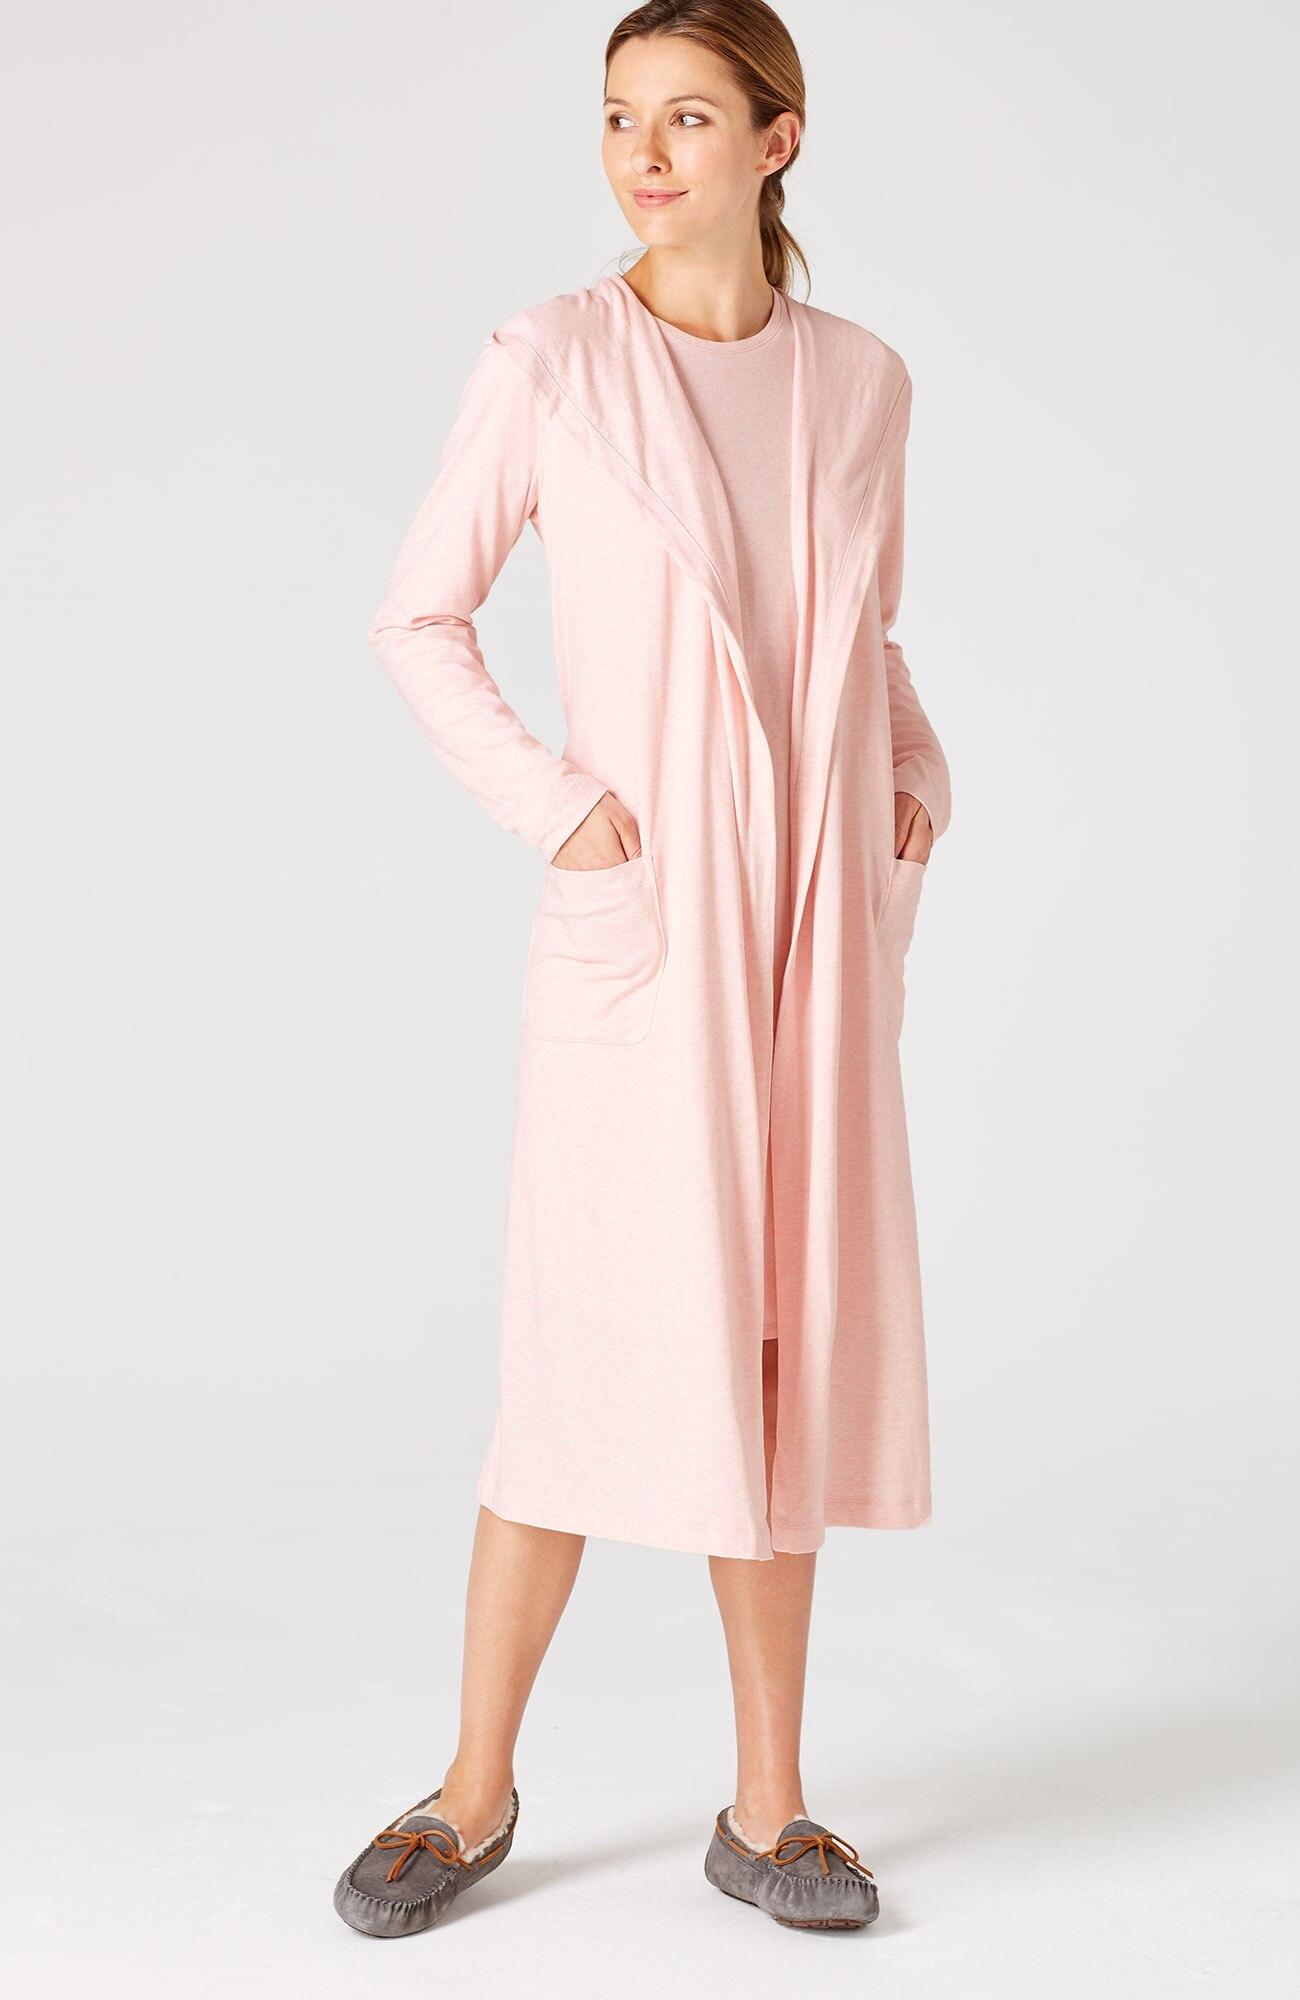 Pure Jill Sleep Sueded Robe